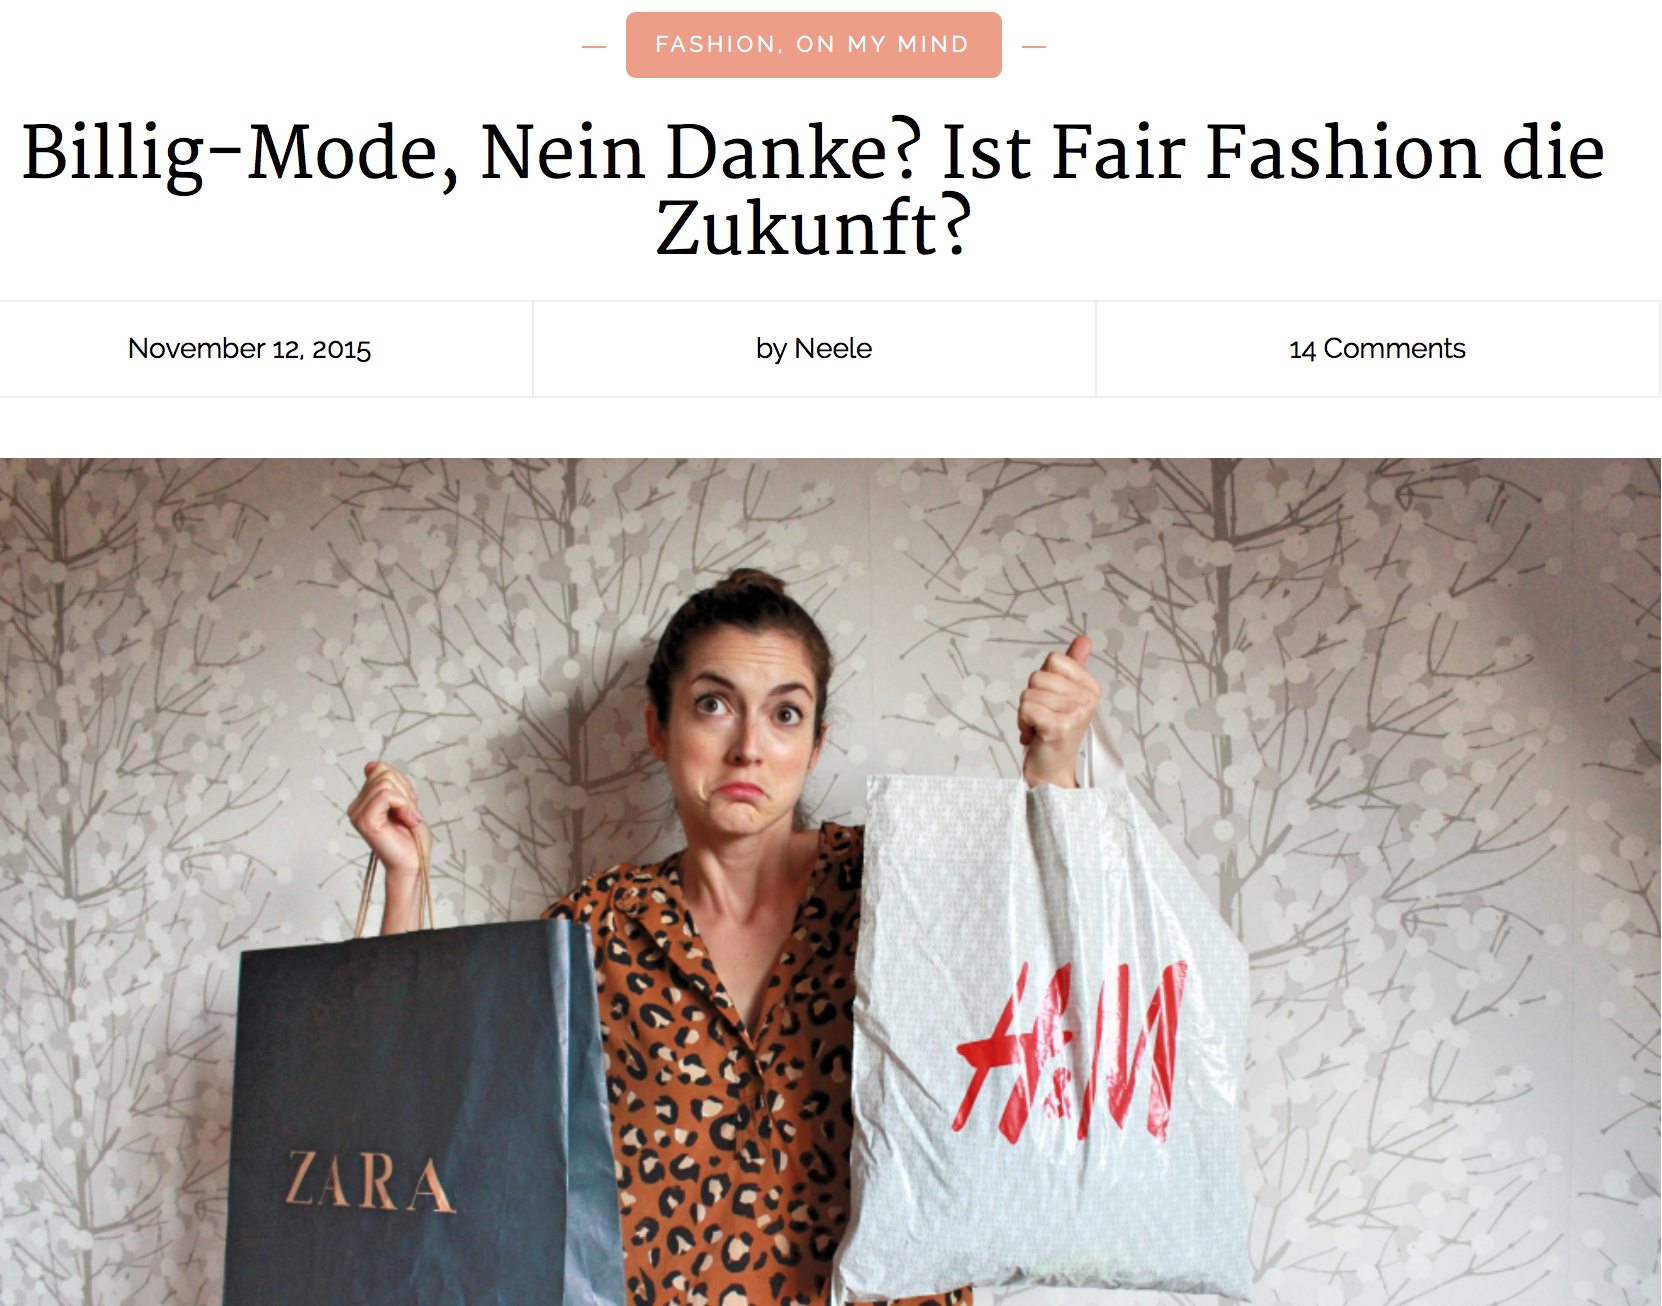 Jahresrückblick 2015 Just a few things Billig Mode Nein Danke